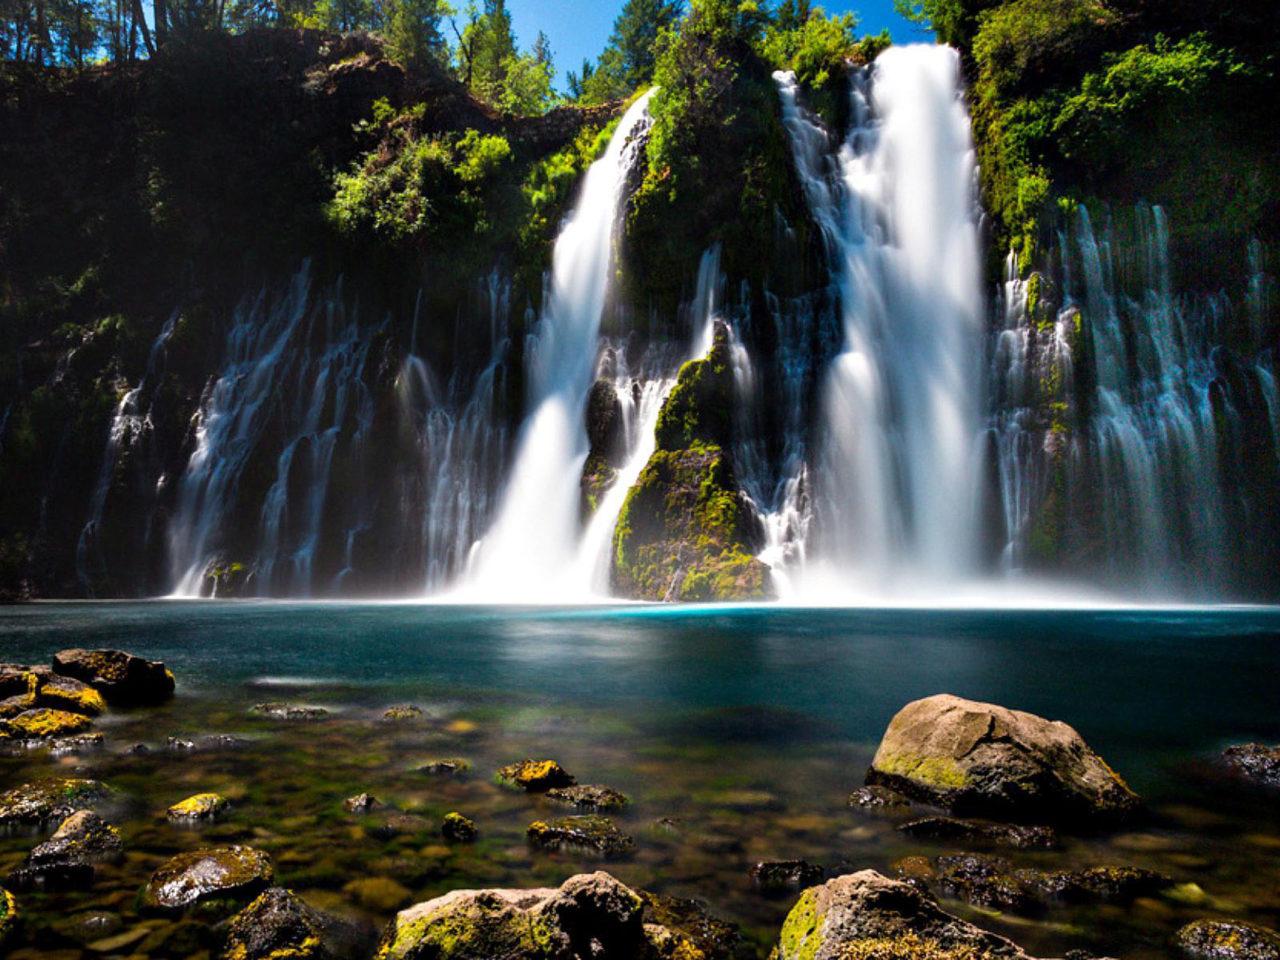 Beautiful Niagara Falls Wallpaper Burney Falls Northern California Turquoise Blue Water Rock